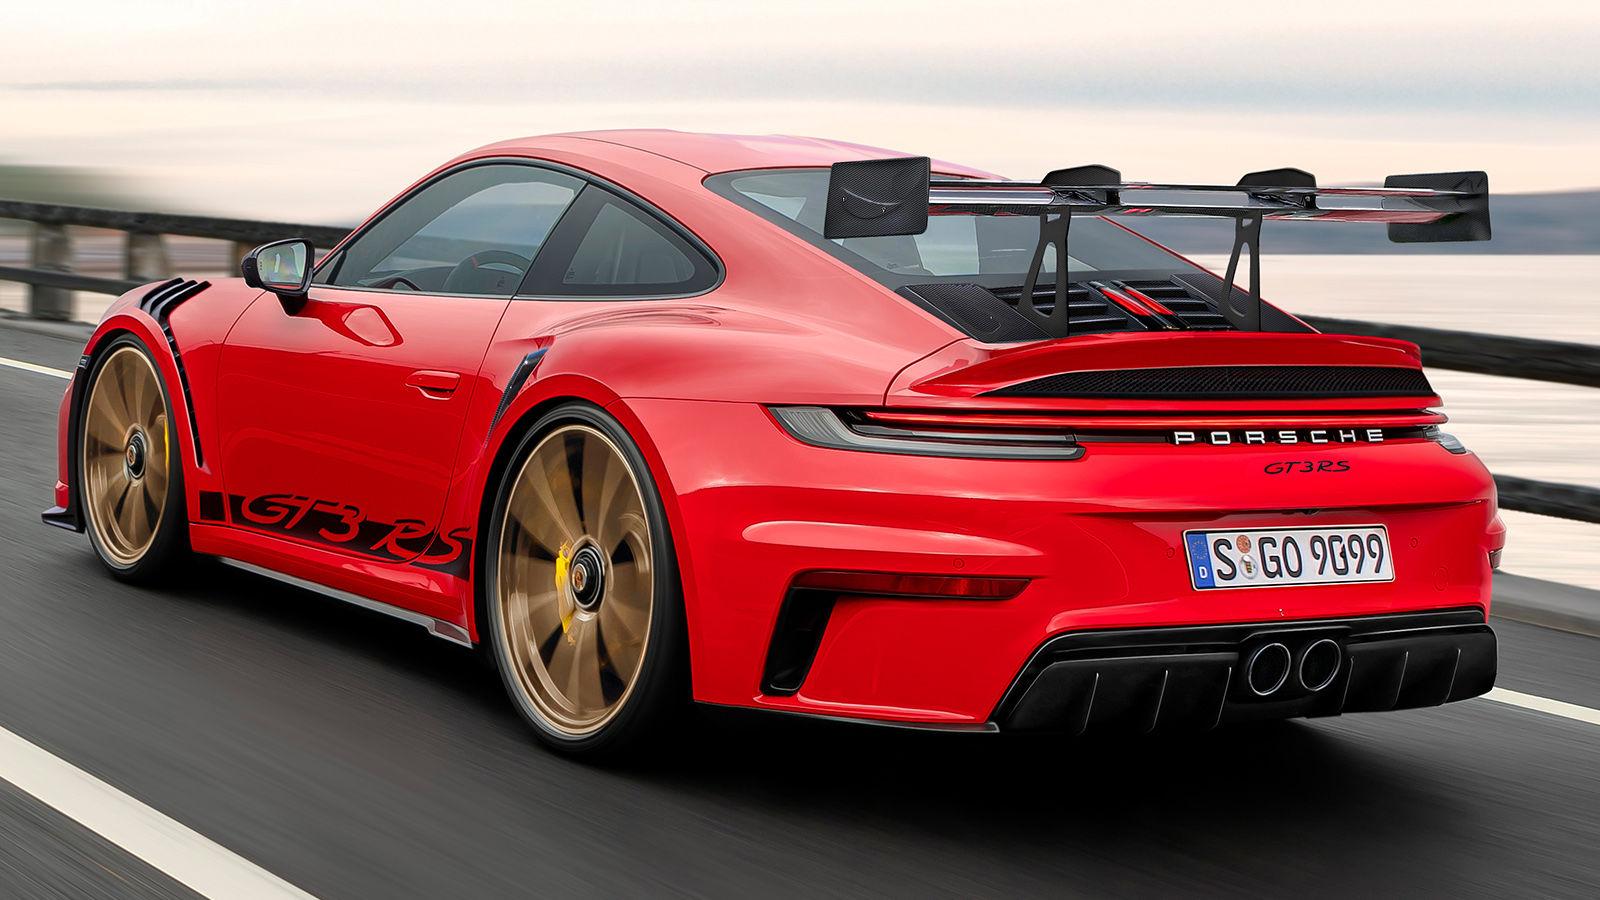 Porsche 911 GT3 RS (2021): Skizze - 992 - Neuvorstellung ...